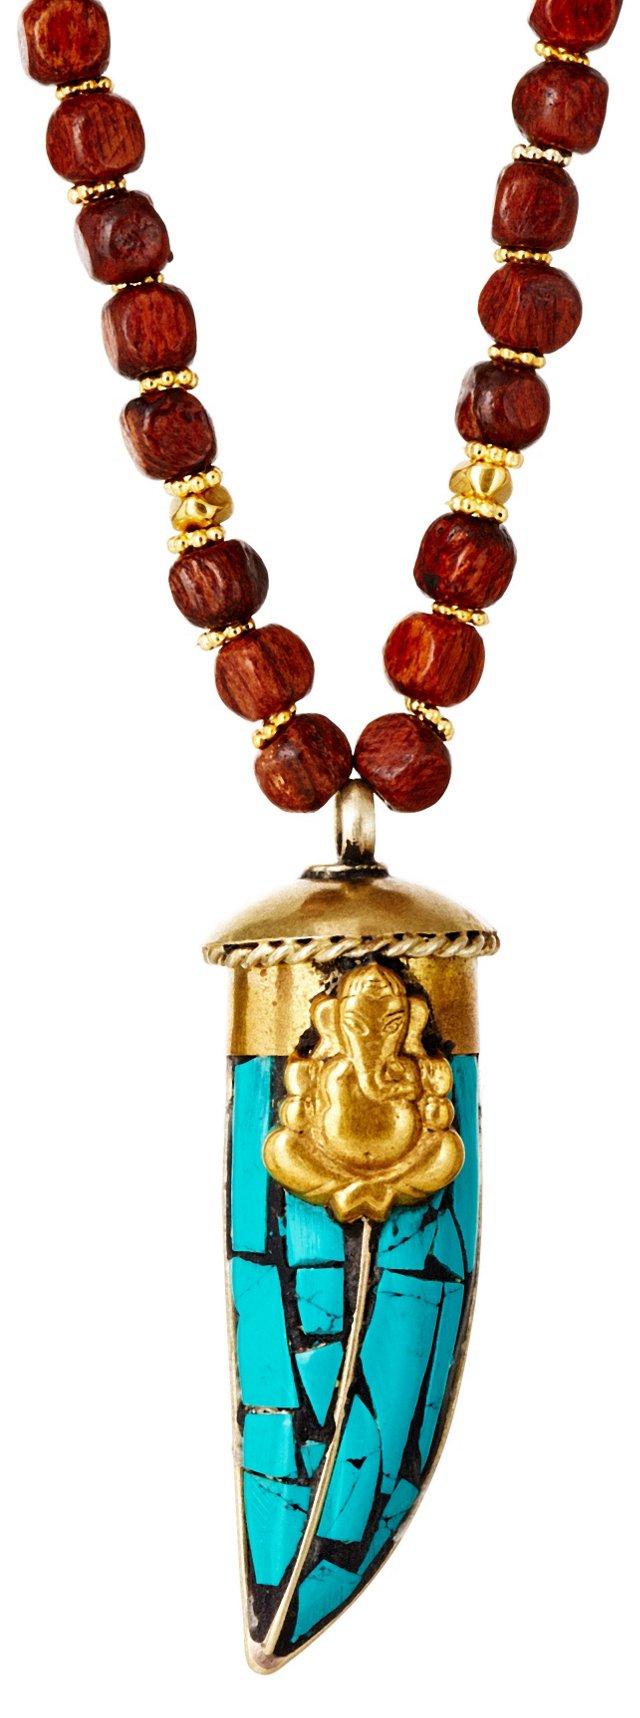 Turquoise Horn Pendant